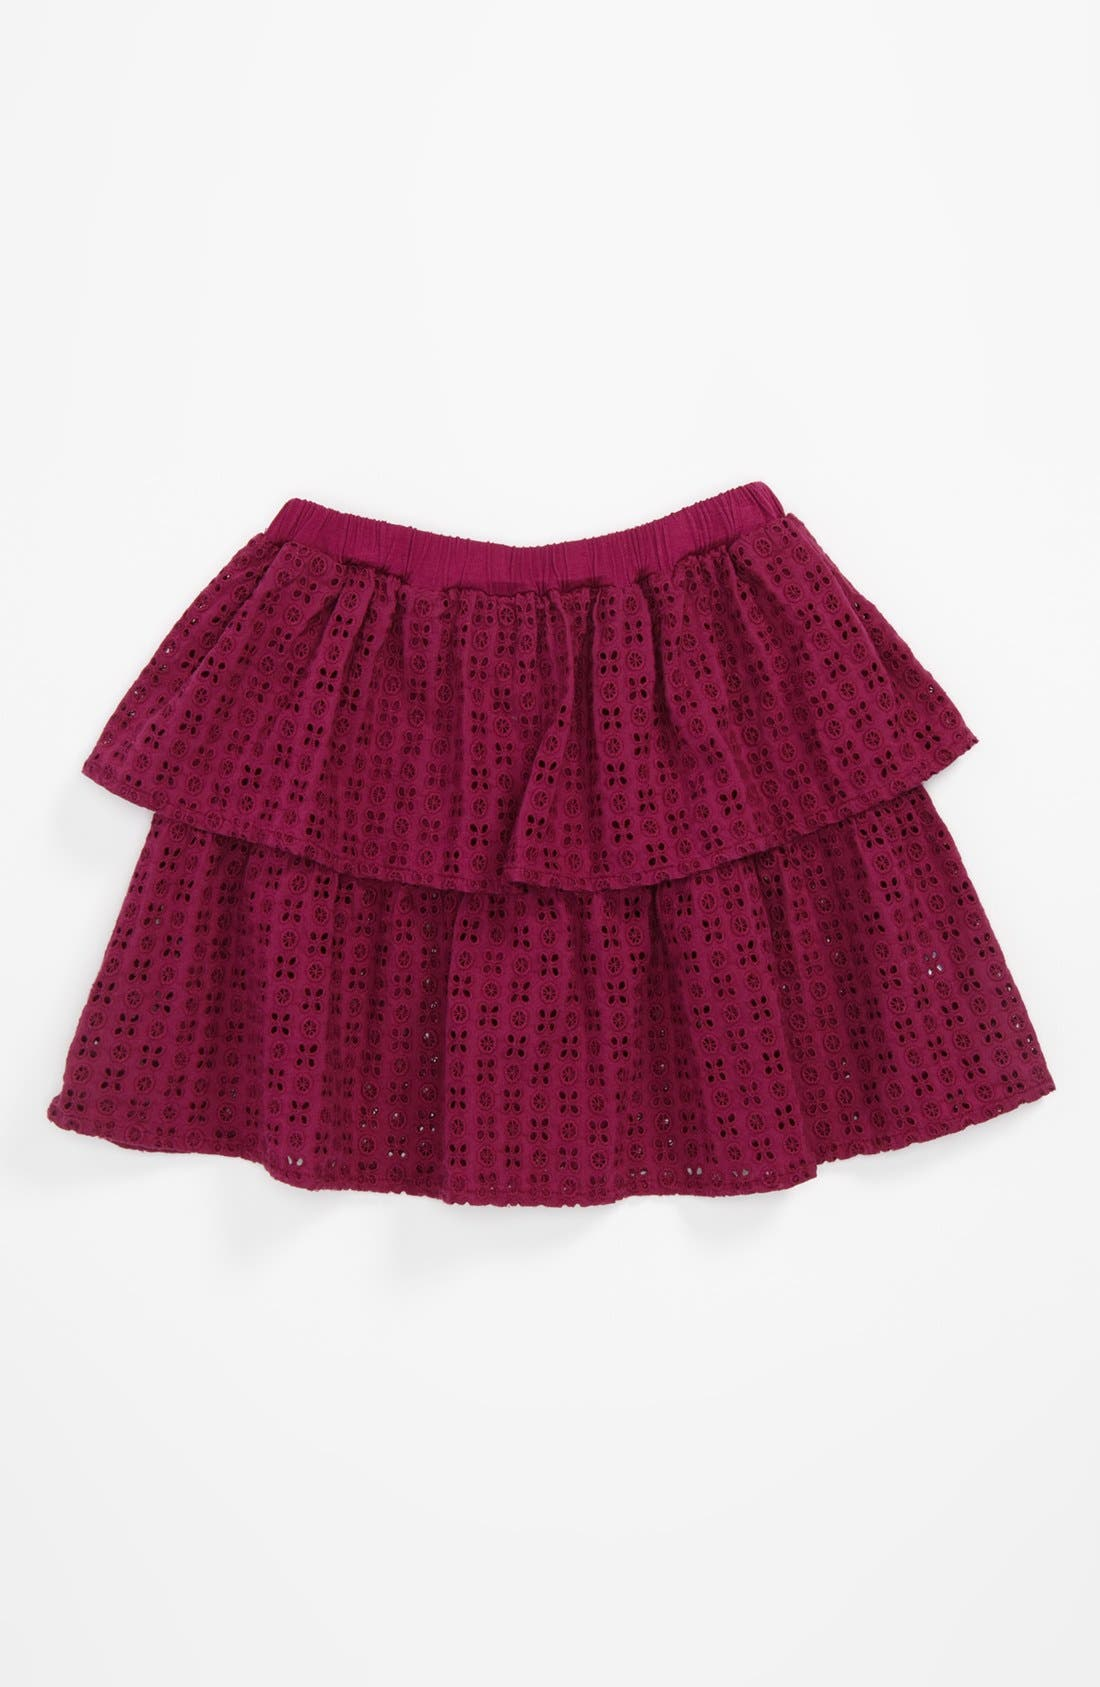 Main Image - Peek 'Catalina' Skirt (Toddler, Little Girls & Big Girls)